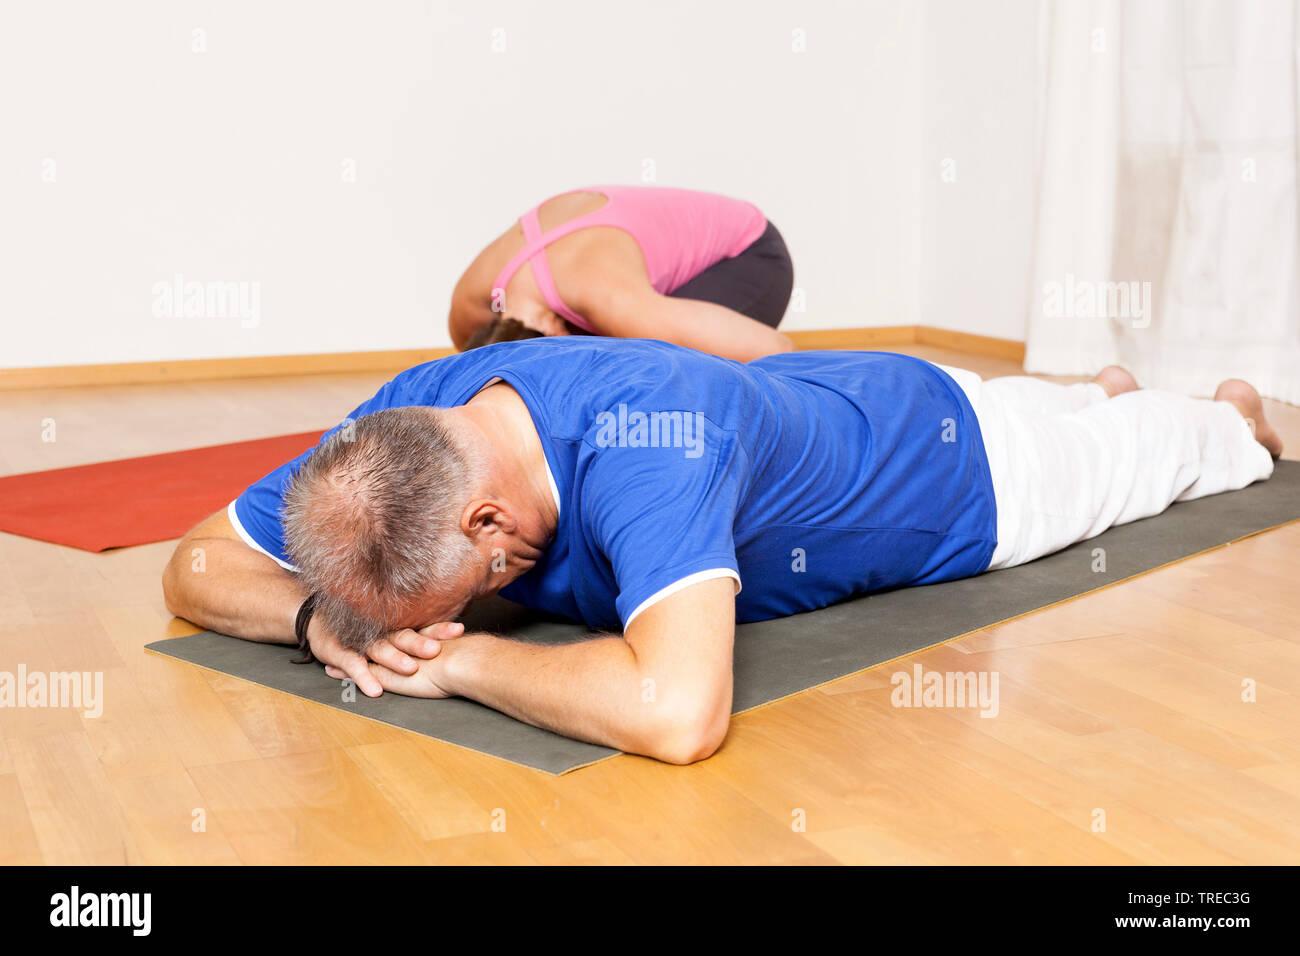 Frau und Mann machen Yoga-Uebungen, Europa | woman and man doing yoga, Europe | BLWS522593.jpg [ (c) blickwinkel/McPHOTO/M. Gann Tel. +49 (0)2302-2793 - Stock Image